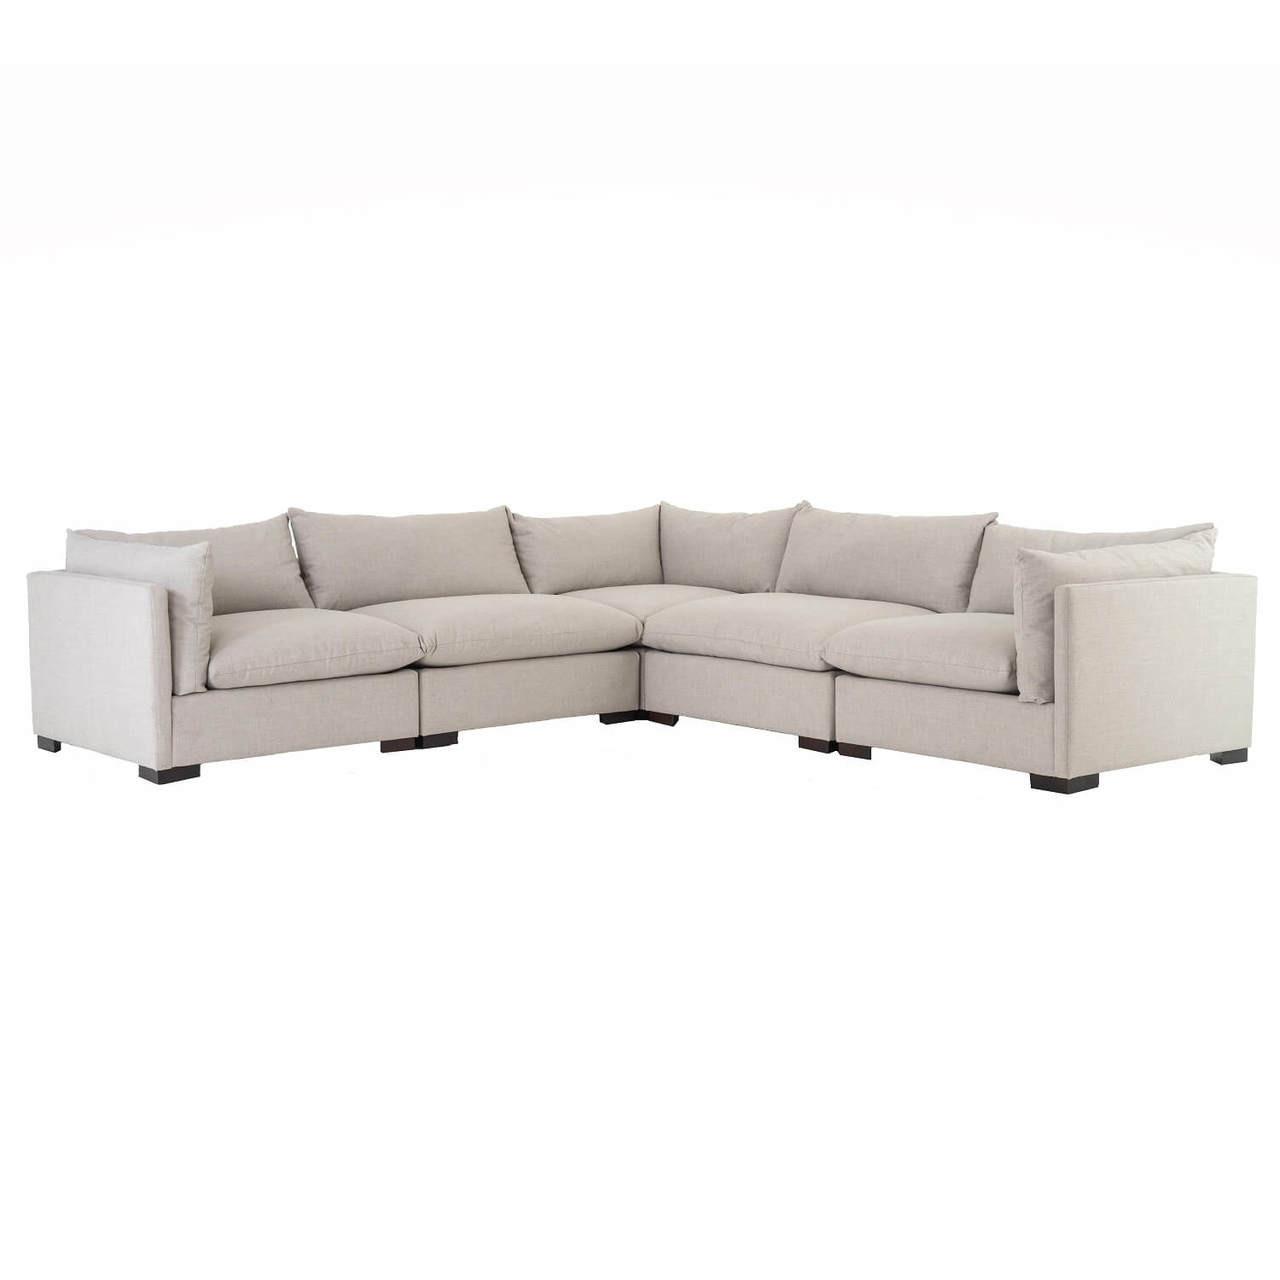 Grant Modern Charcoal Grey Armless Corner Sectional: Westworld Modern Neutral Beige 5-Piece Corner Sectional